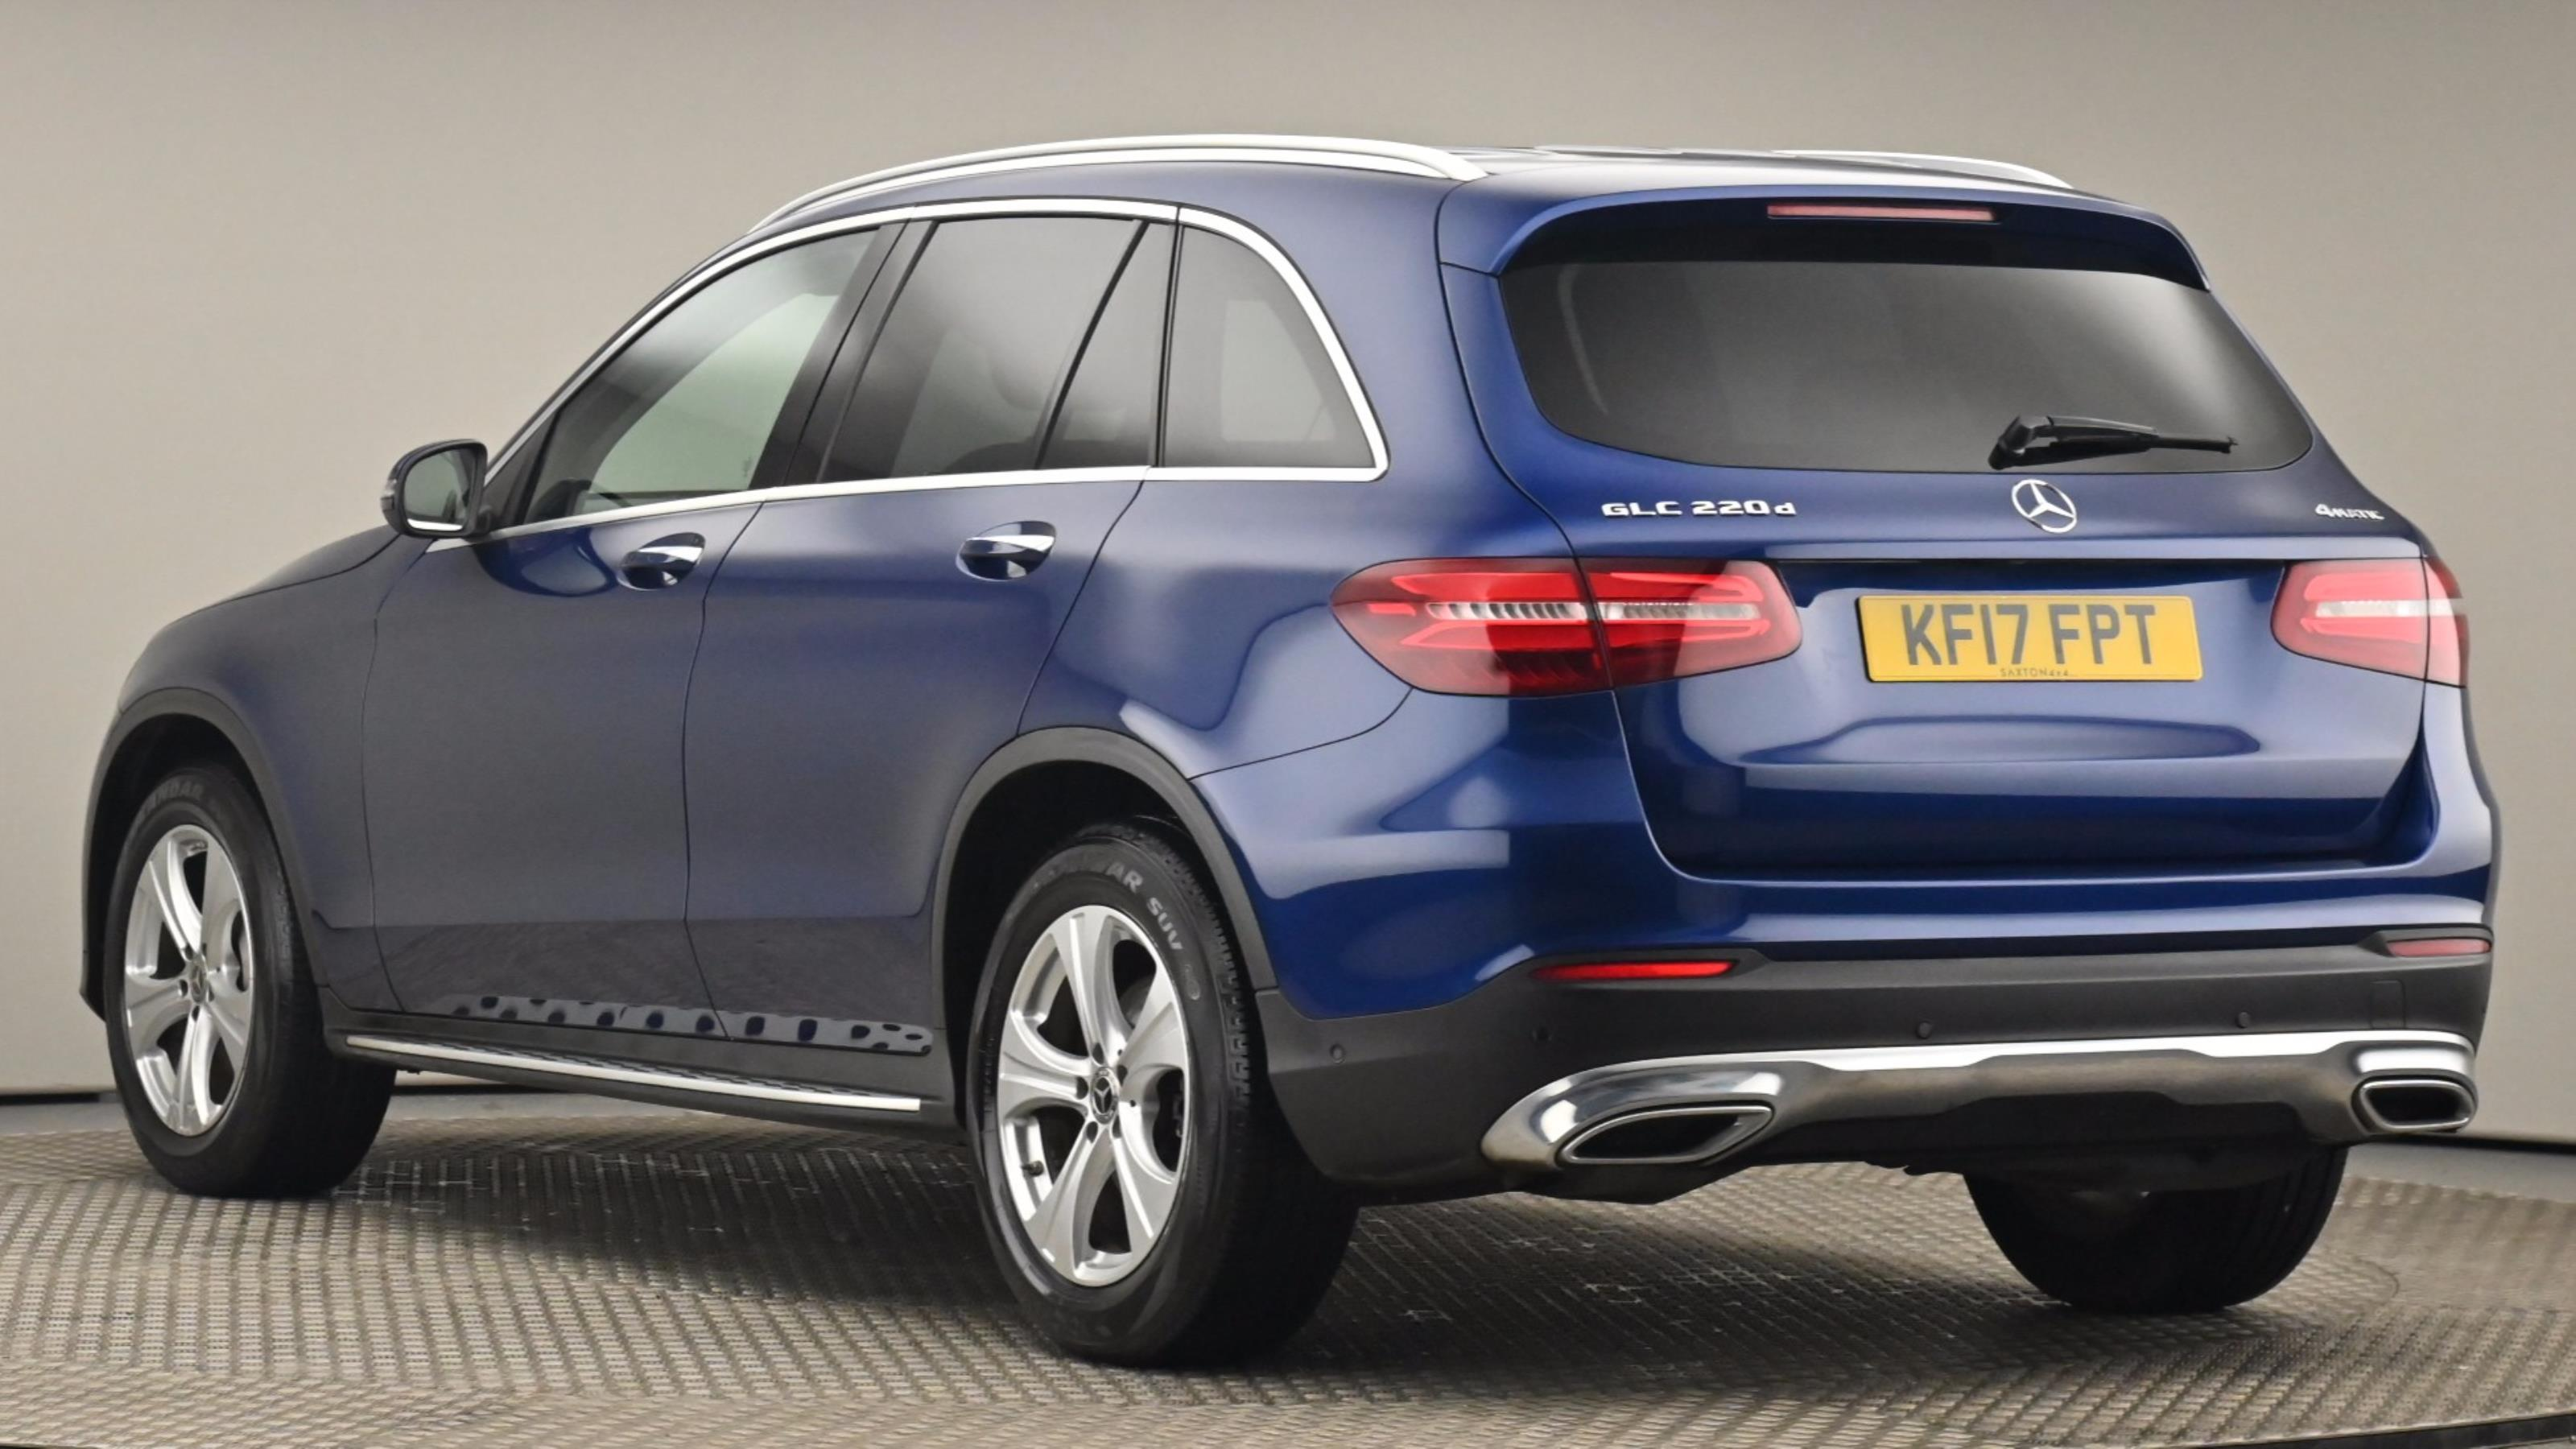 Used 2017 Mercedes-Benz GLC COUPE GLC 220d 4Matic Sport Premium Plus 5dr 9G-Tronic BLUE at Saxton4x4